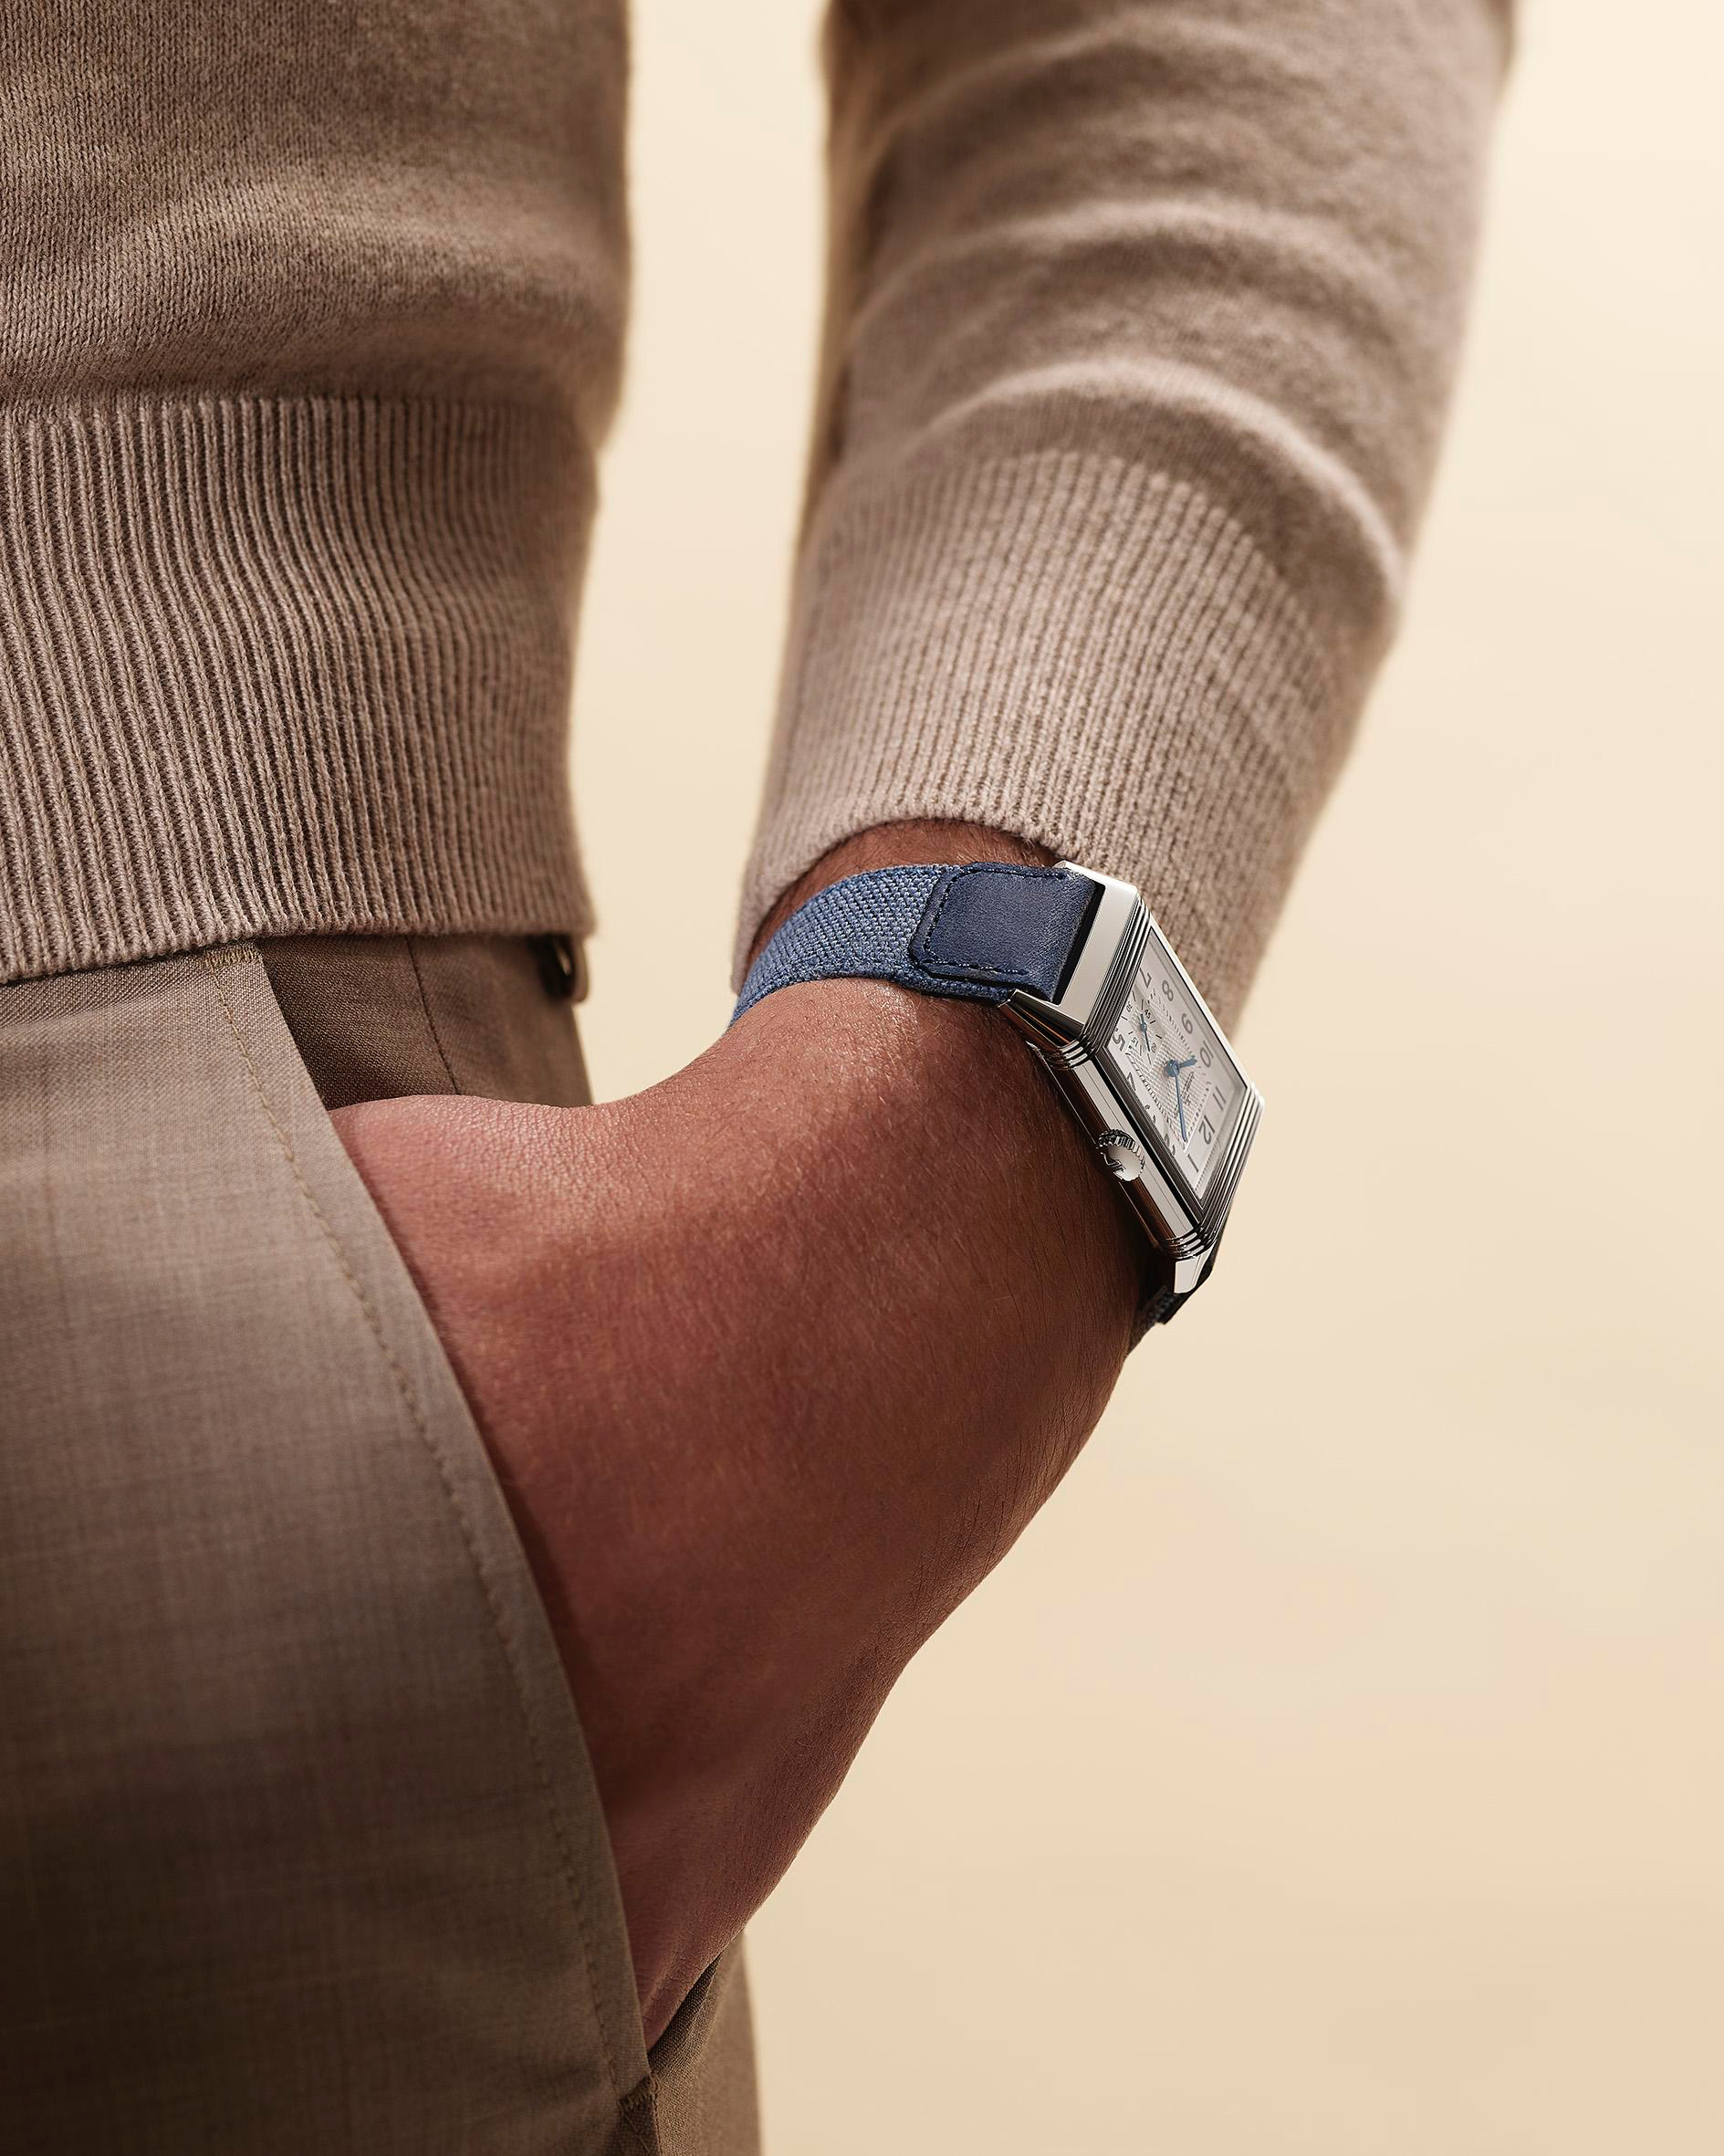 Jaeger-LeCoultre Casa Fagliano Reverso Strap Pale Blue wristshot